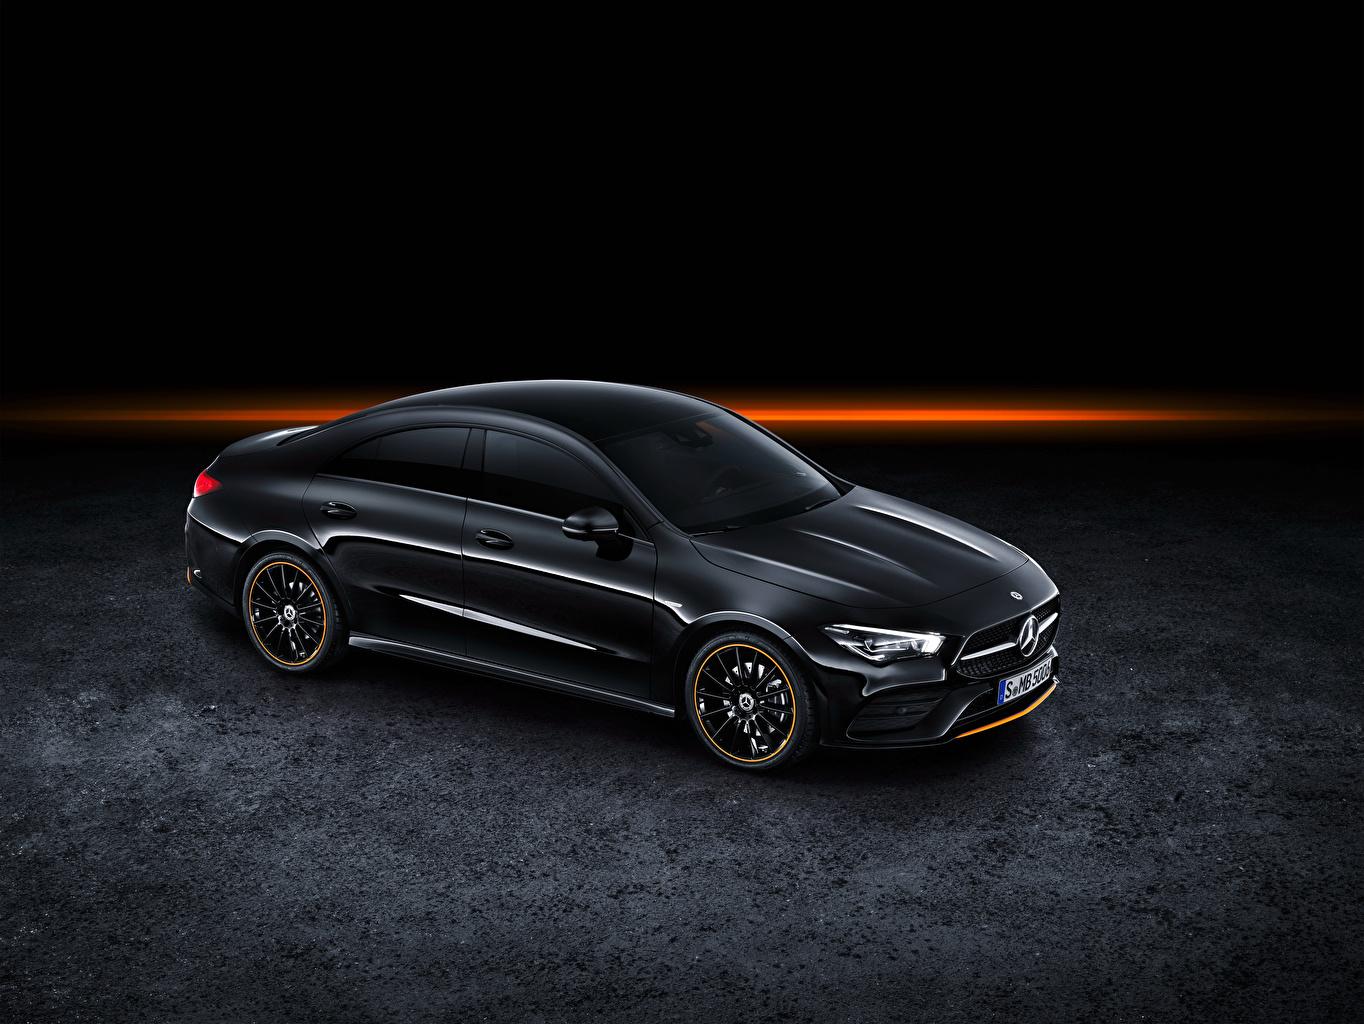 Mercedes-Benz_2019_CLA_250_AMG_Line_Edition_Orange_559211_1364x1024.jpg